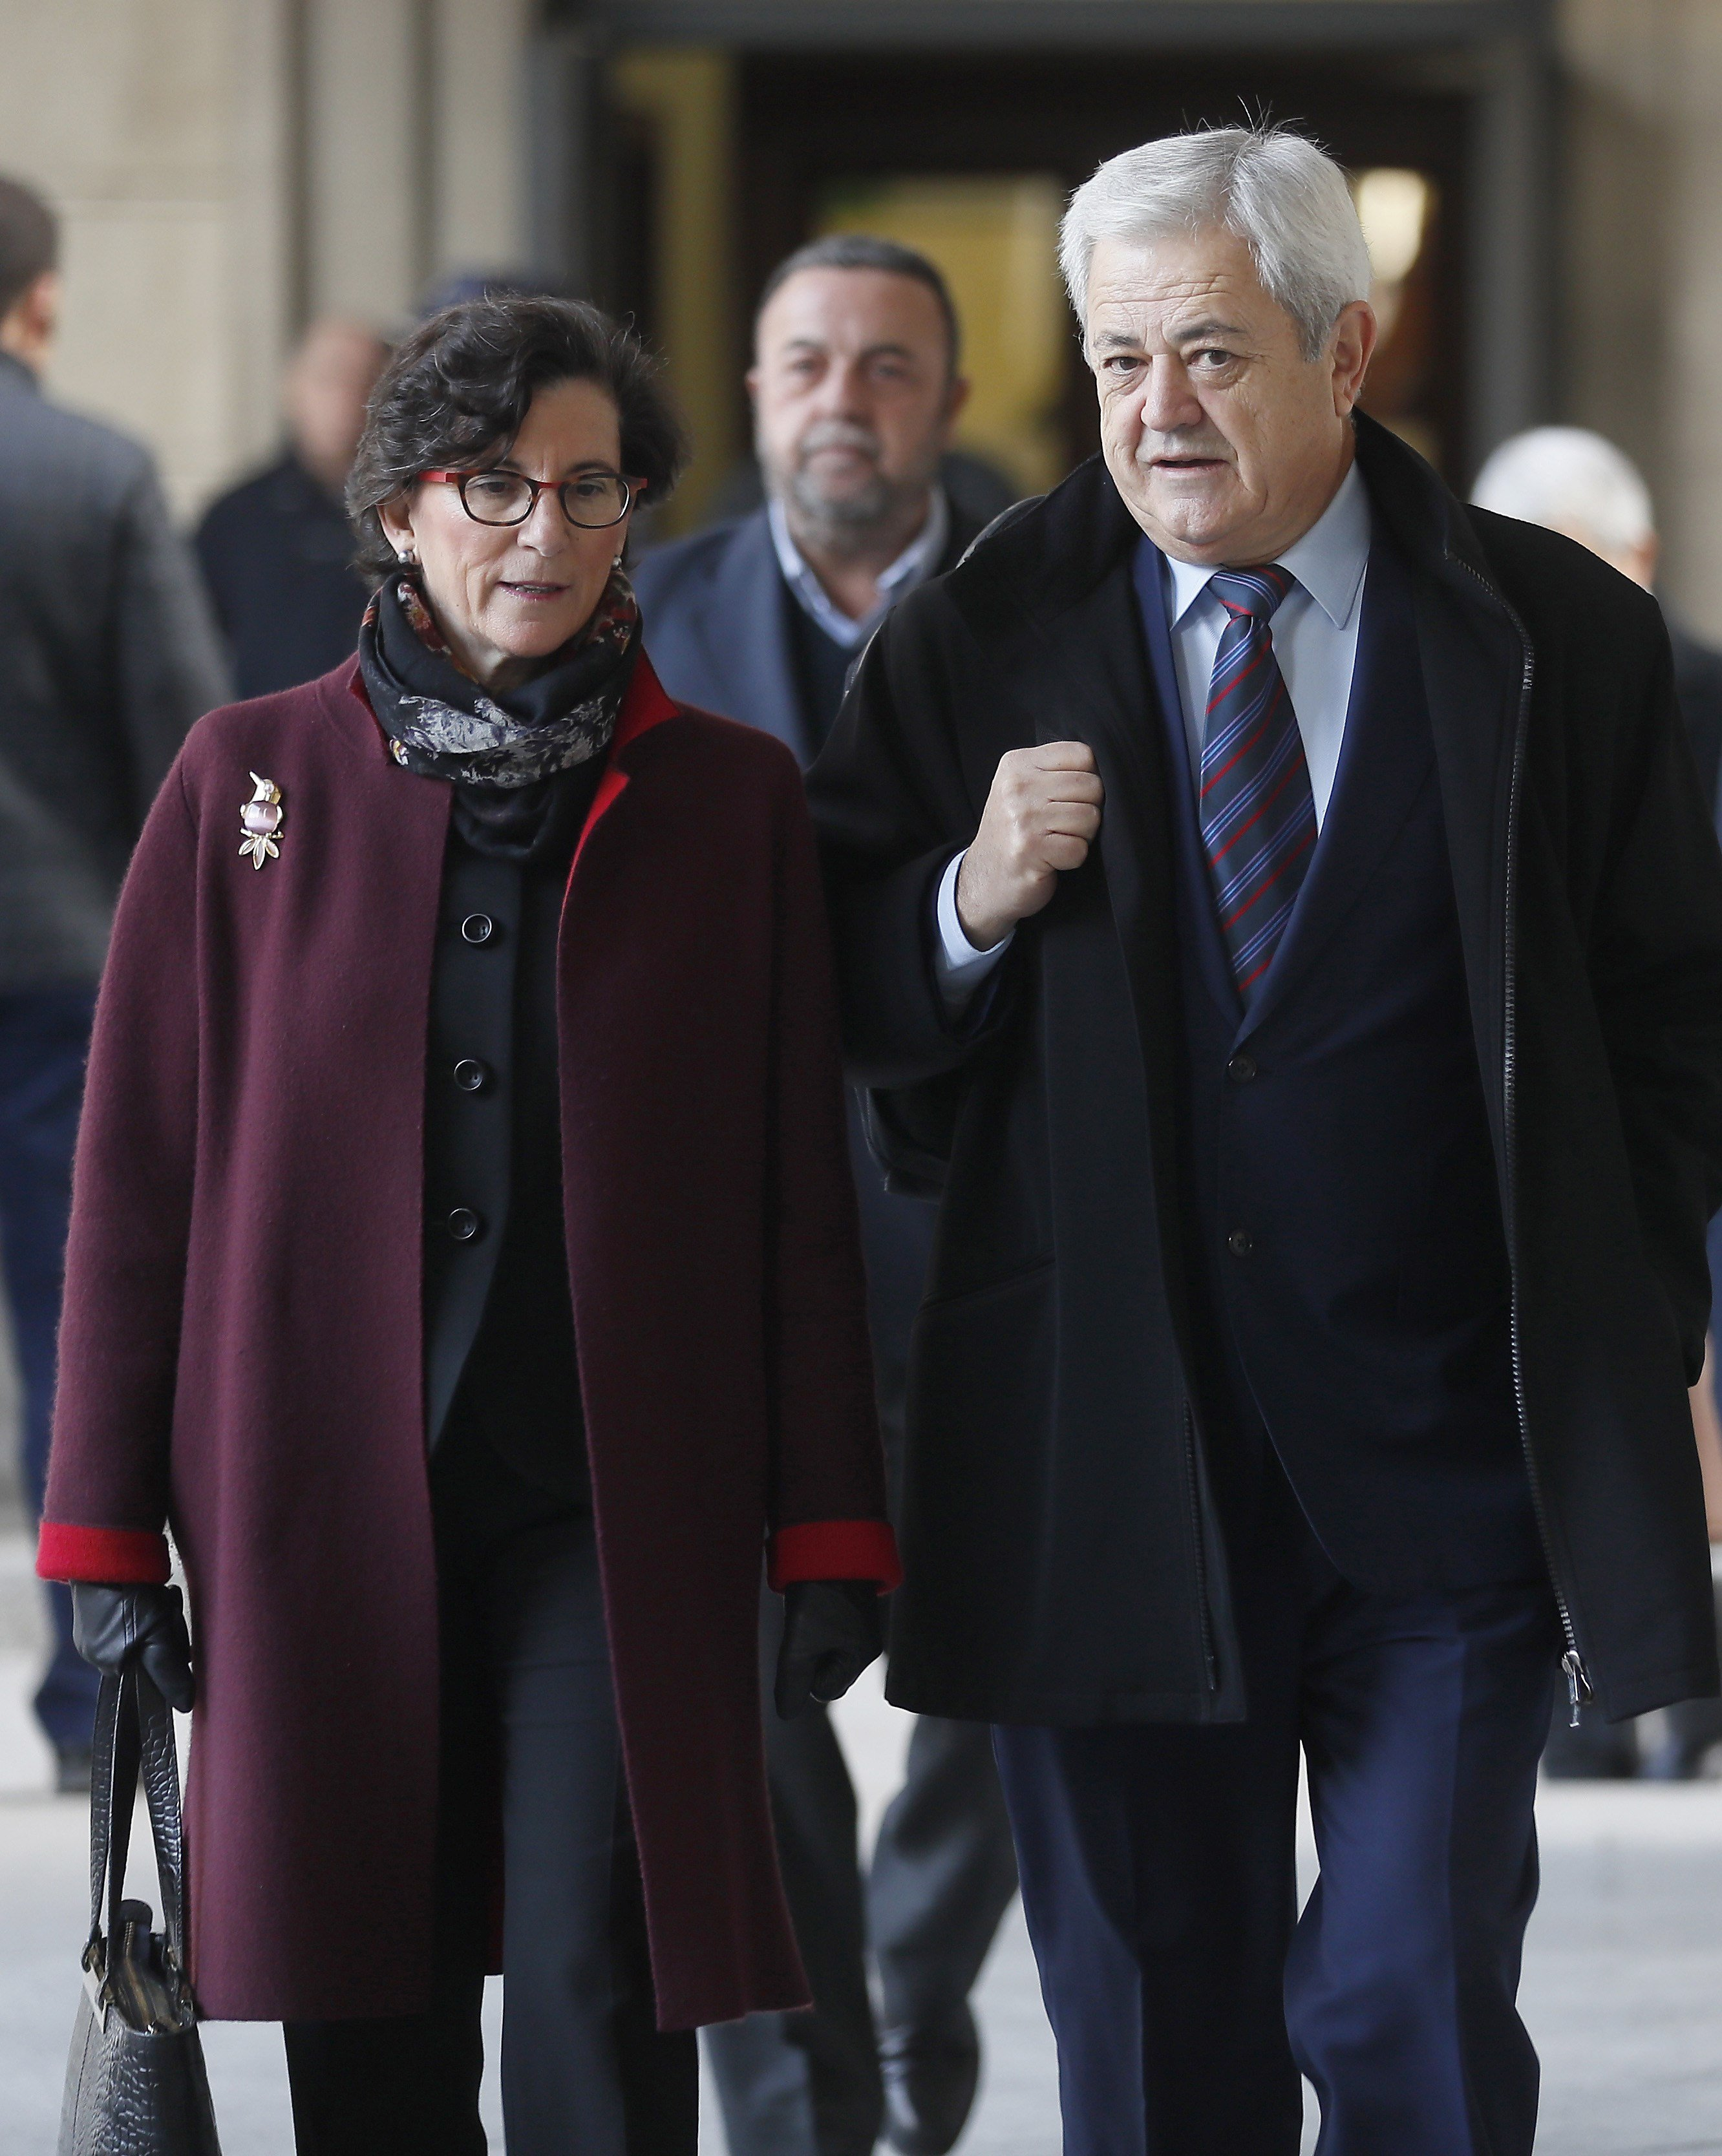 Juzgado de guardia » Jorge Muñoz